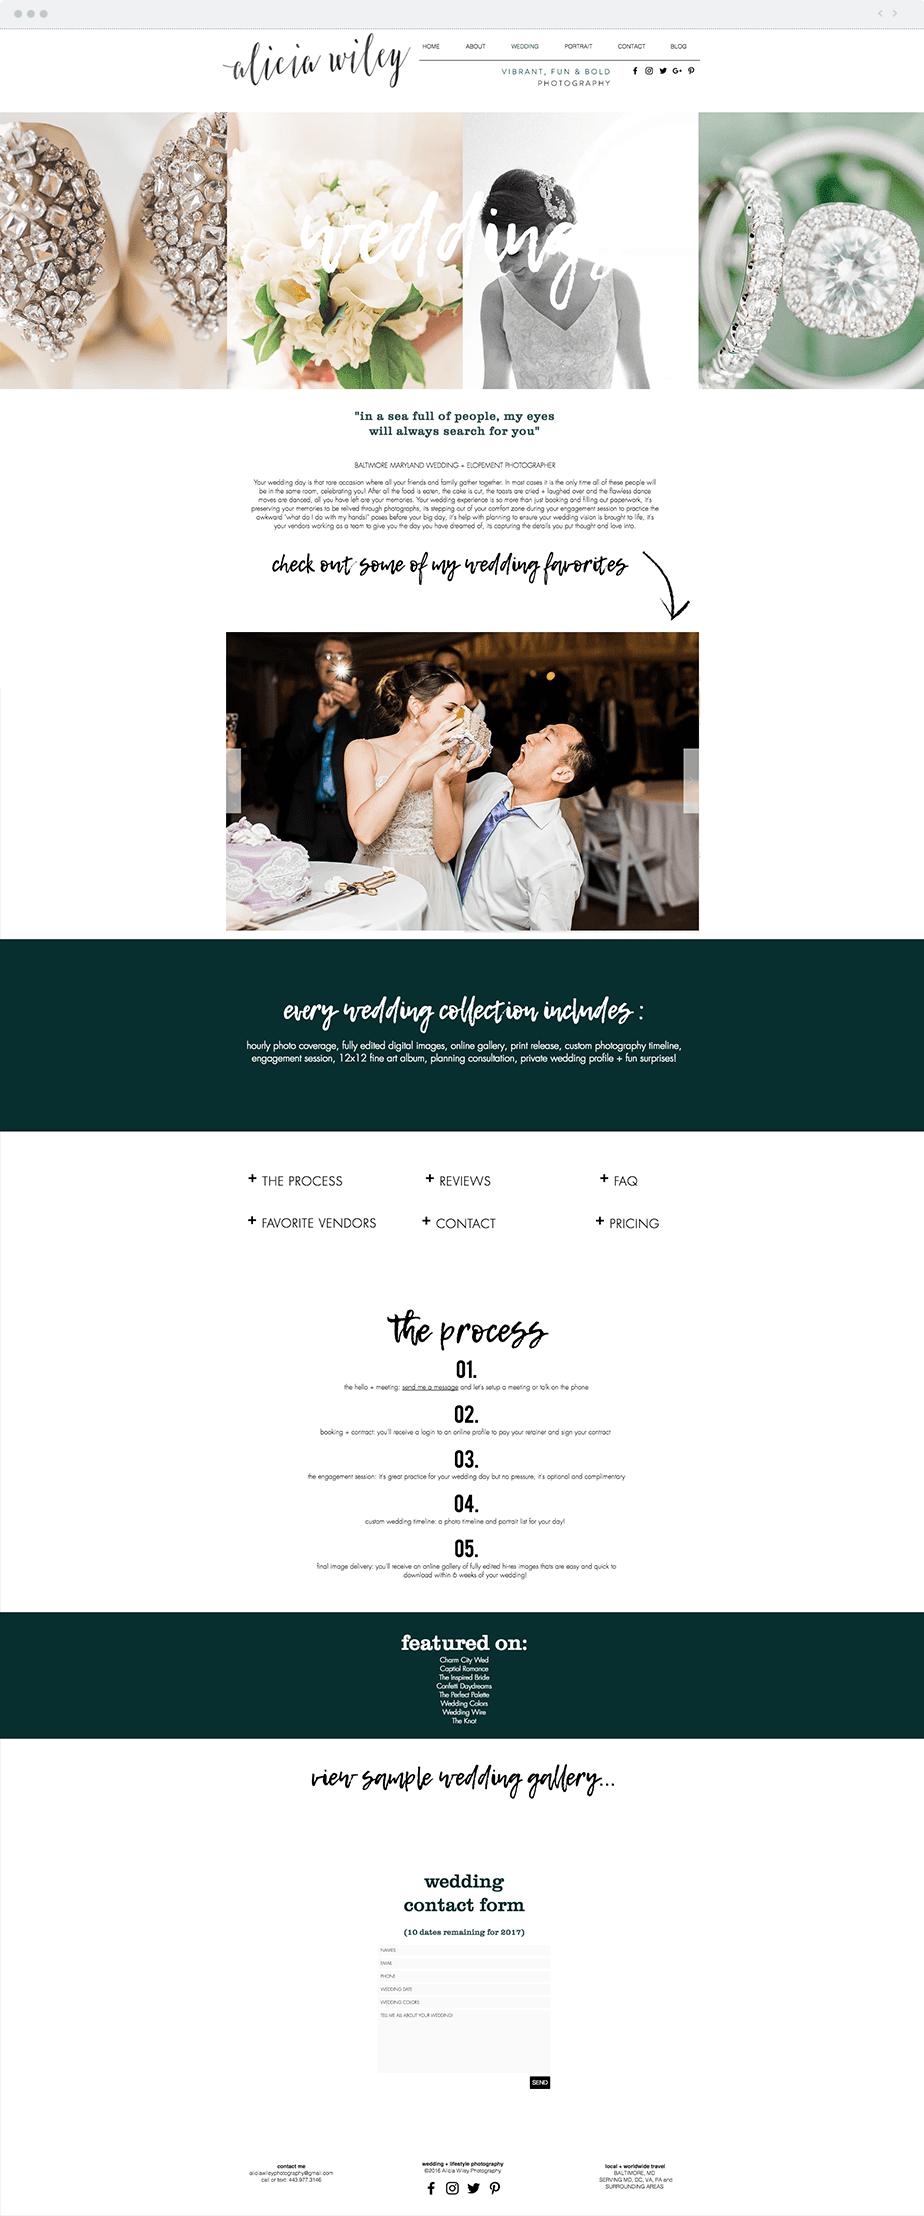 Stunning Wix online portfolio by wedding photographer Alicia Wiley